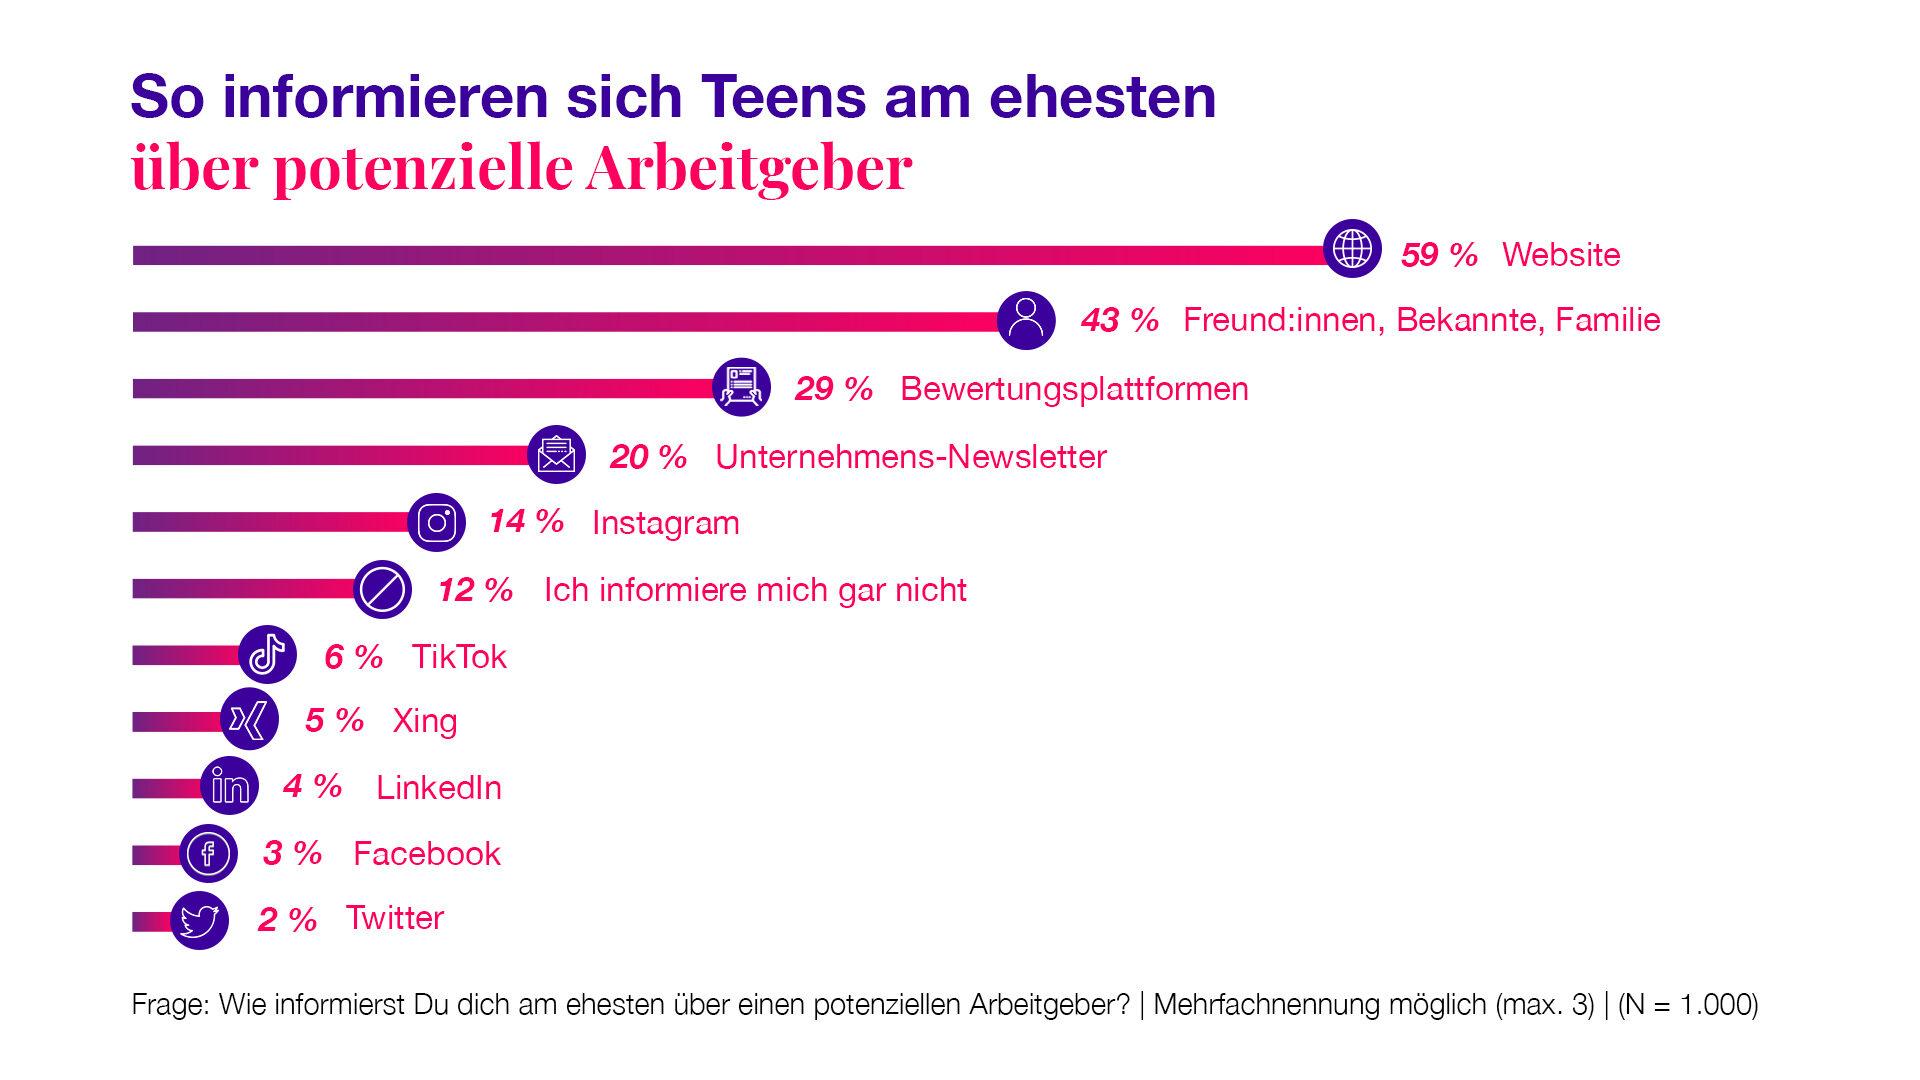 Teengeist-Grafik: Arbeitgeber Informationen